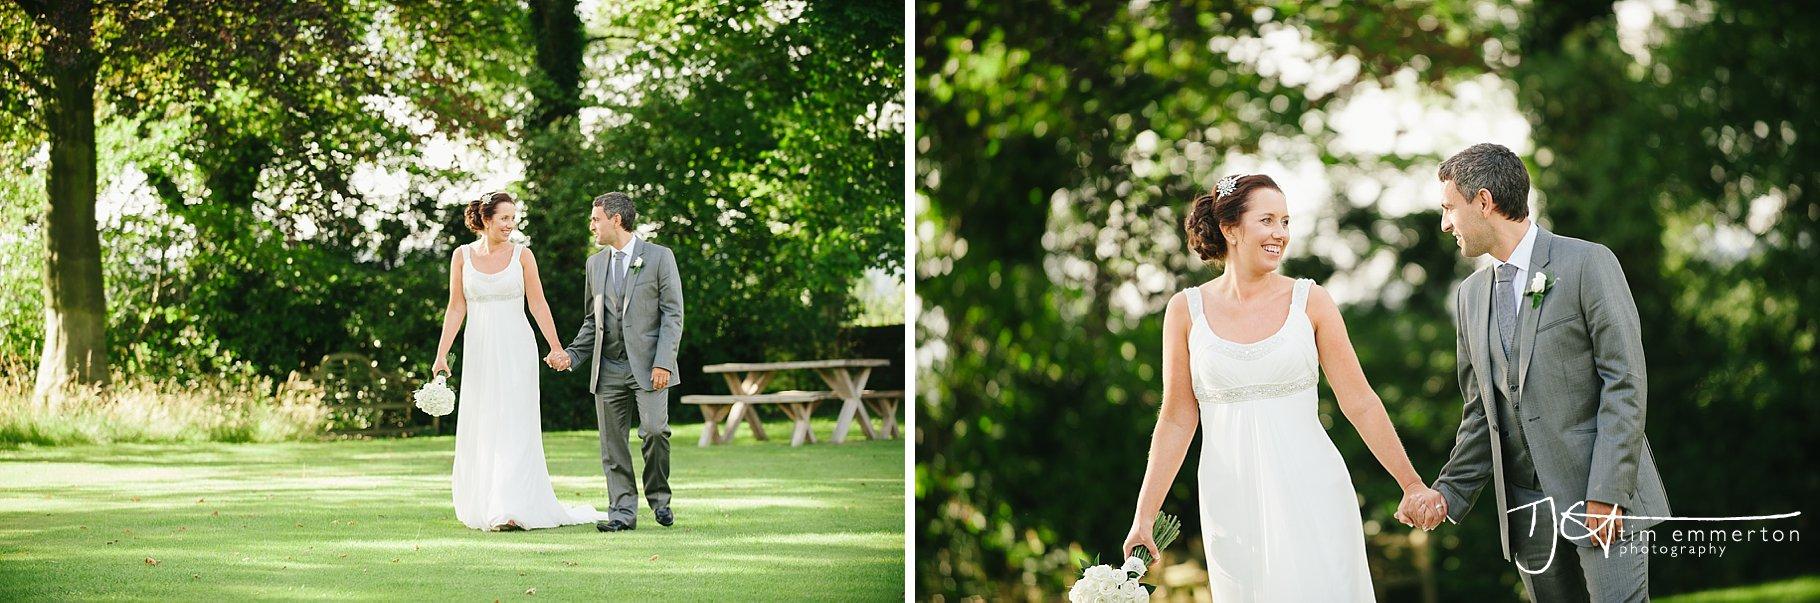 Northcote-Wedding-Photos-345.jpg